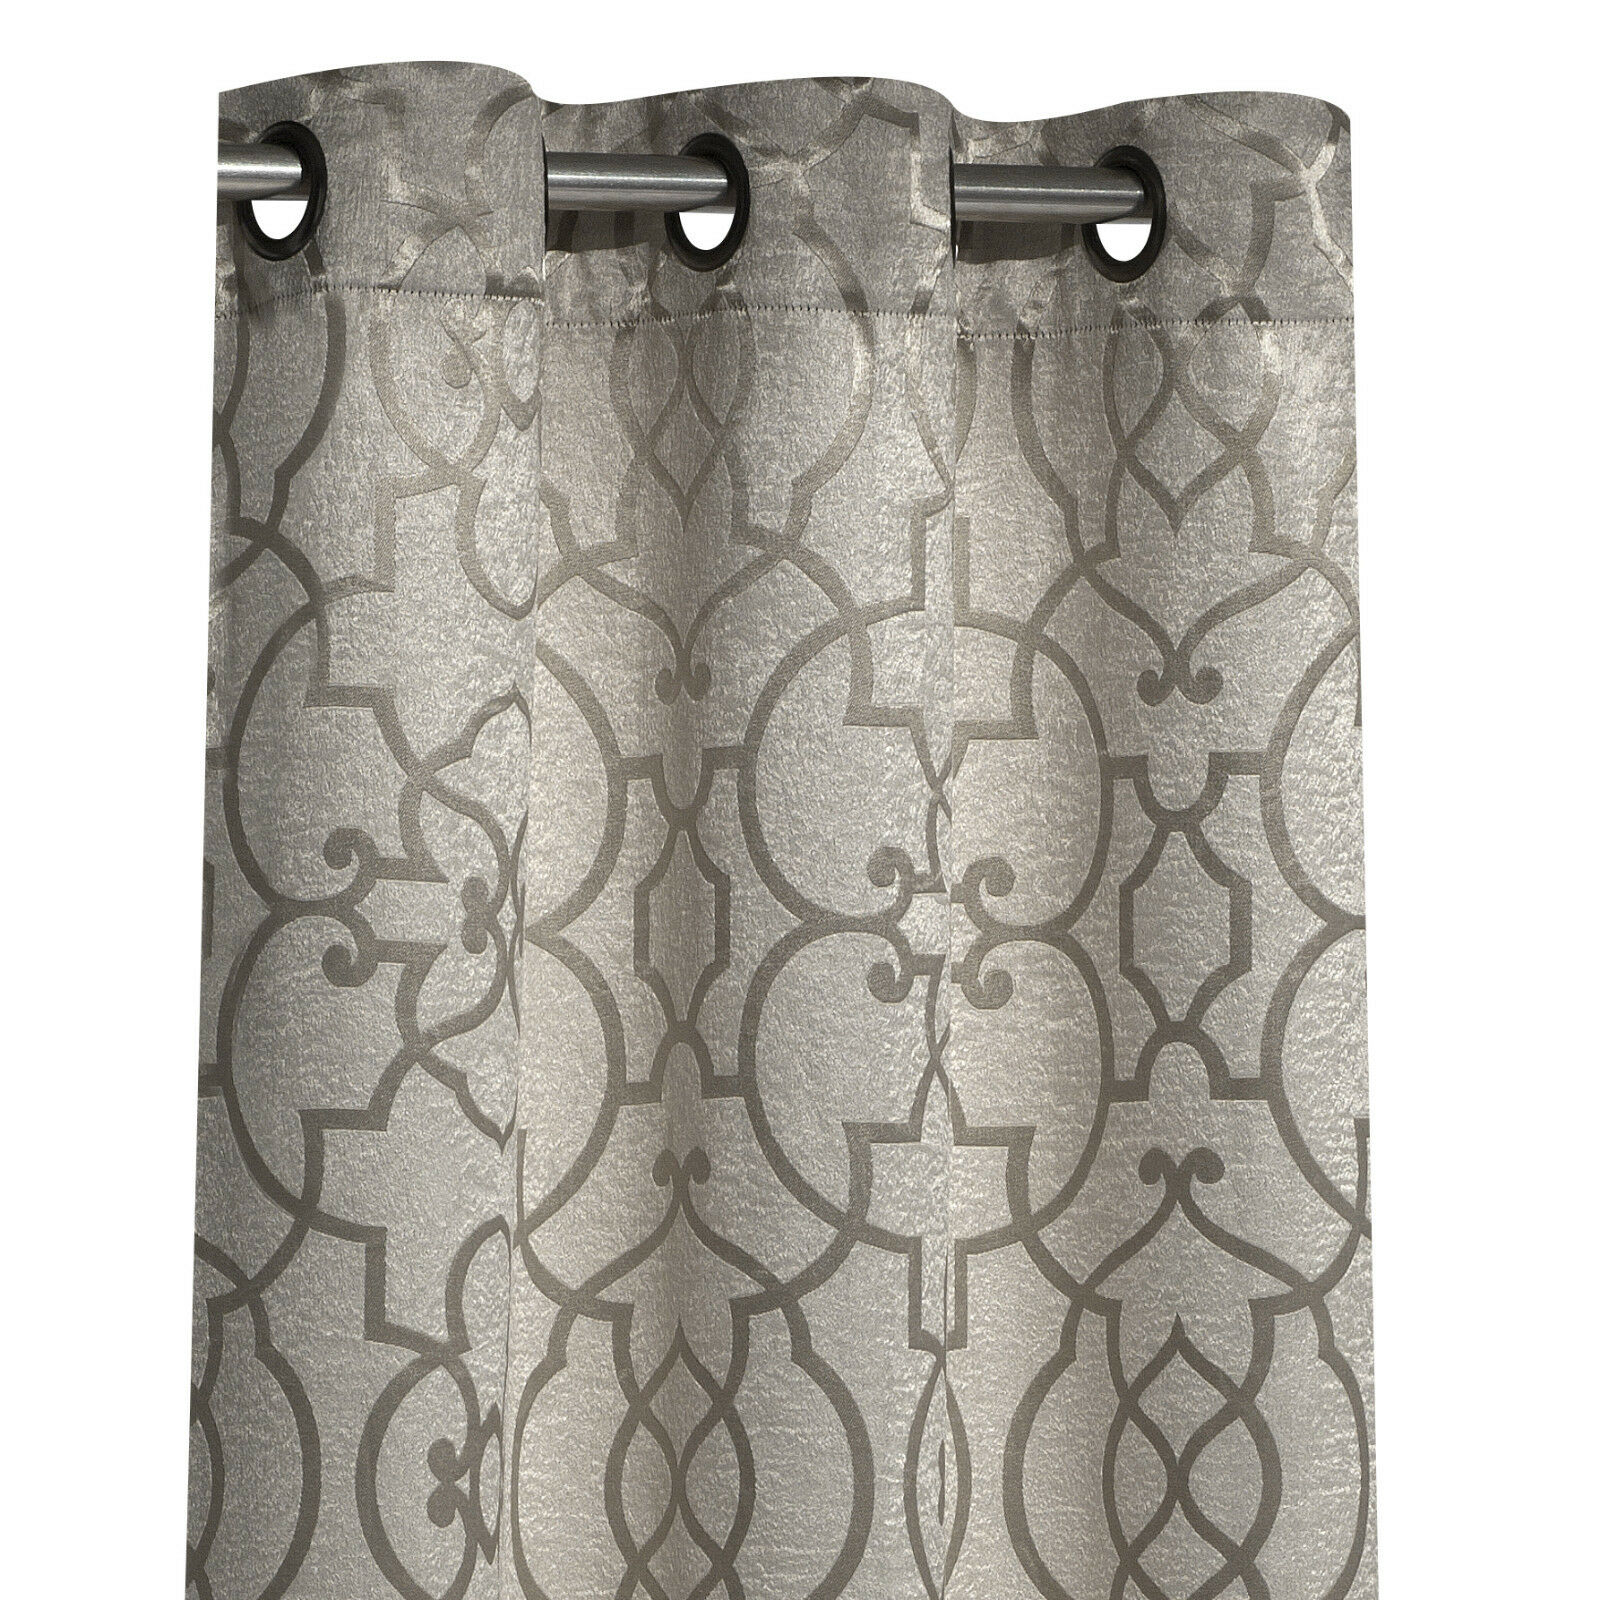 2 Pack: Regal Reversible Geometric Blackout Grommet Curtains - Assorted Colors